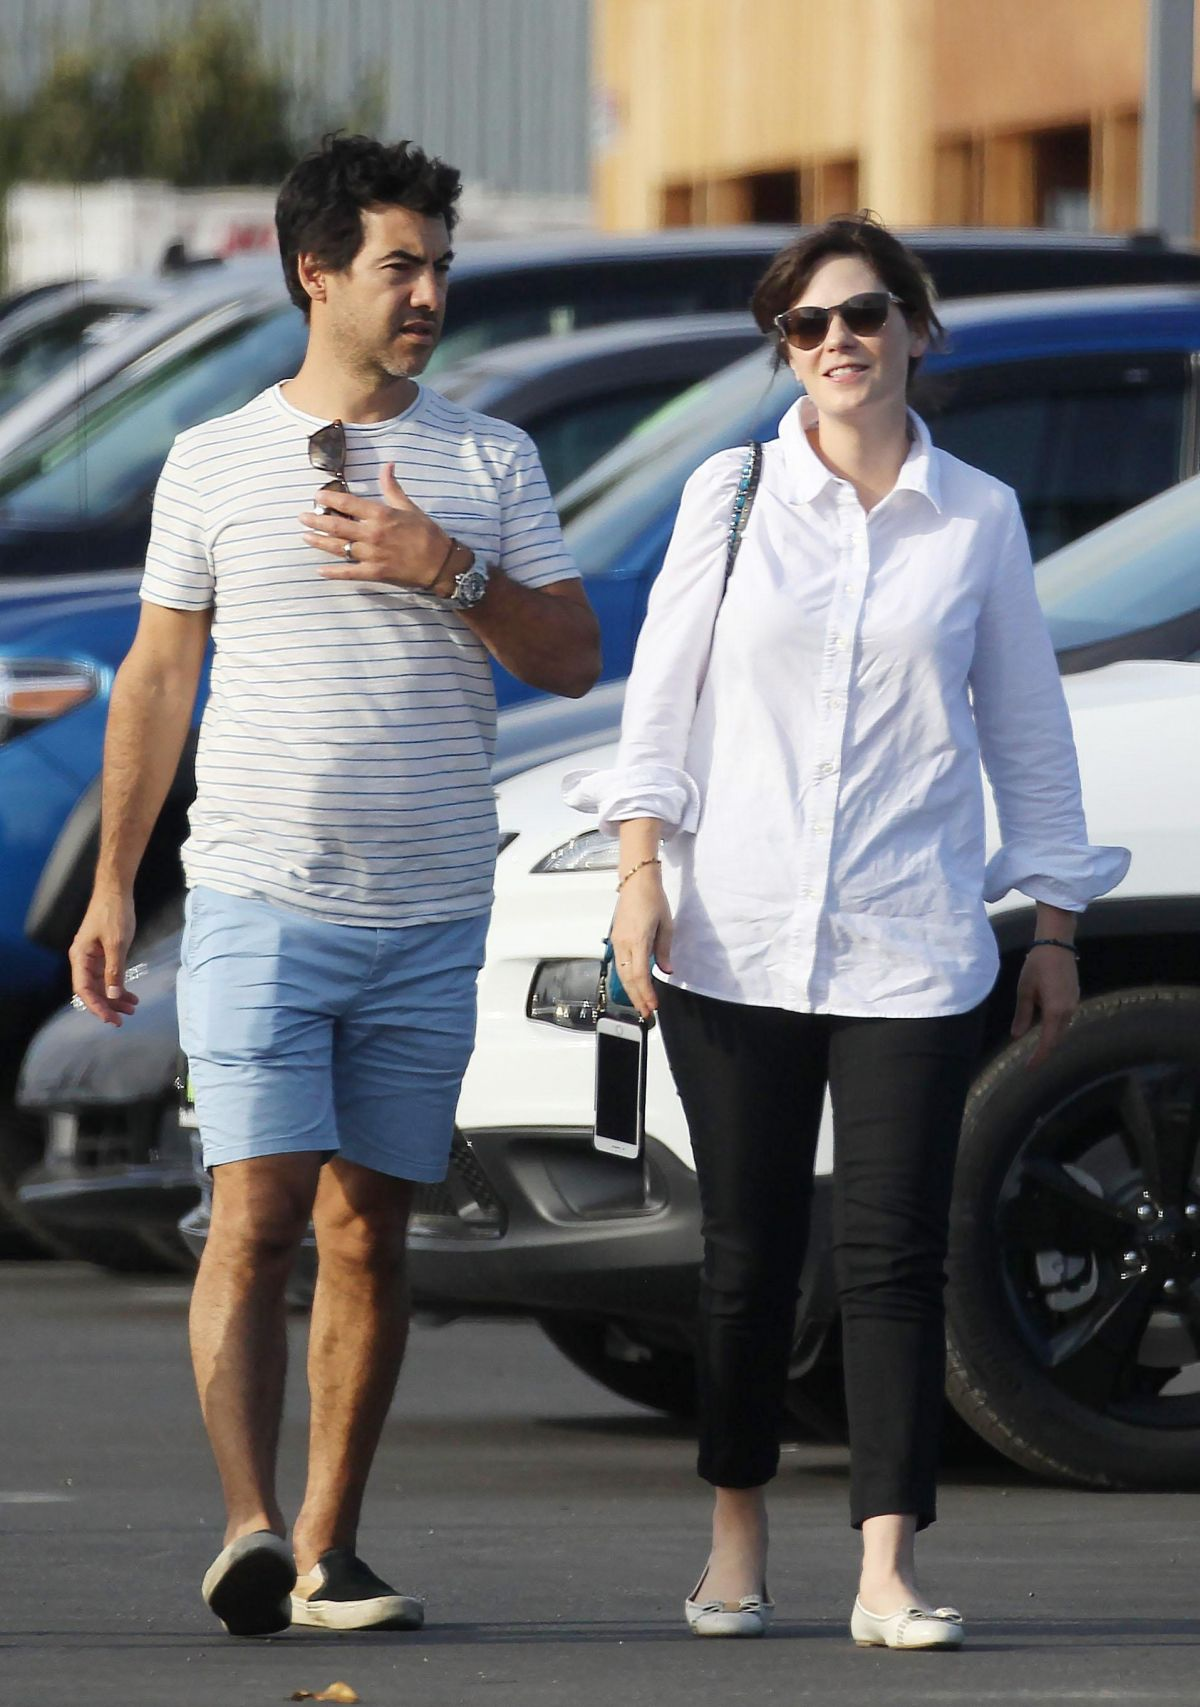 zoey deschanel and her husband jacob pechenik shopping for